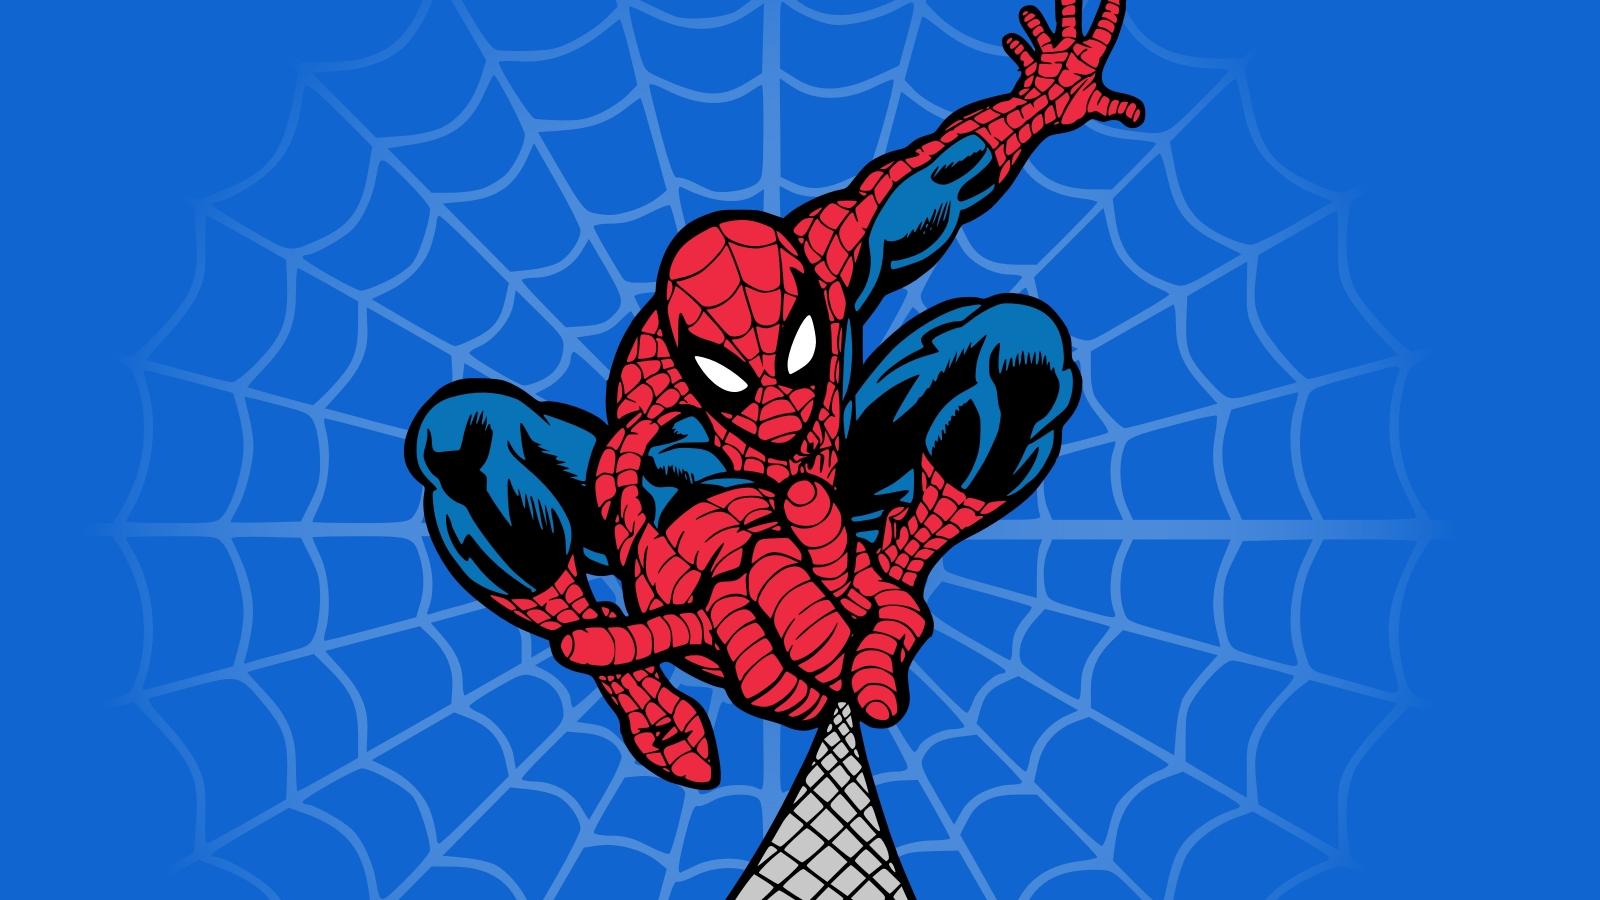 spiderman wallpaper 1600x900 july - photo #38